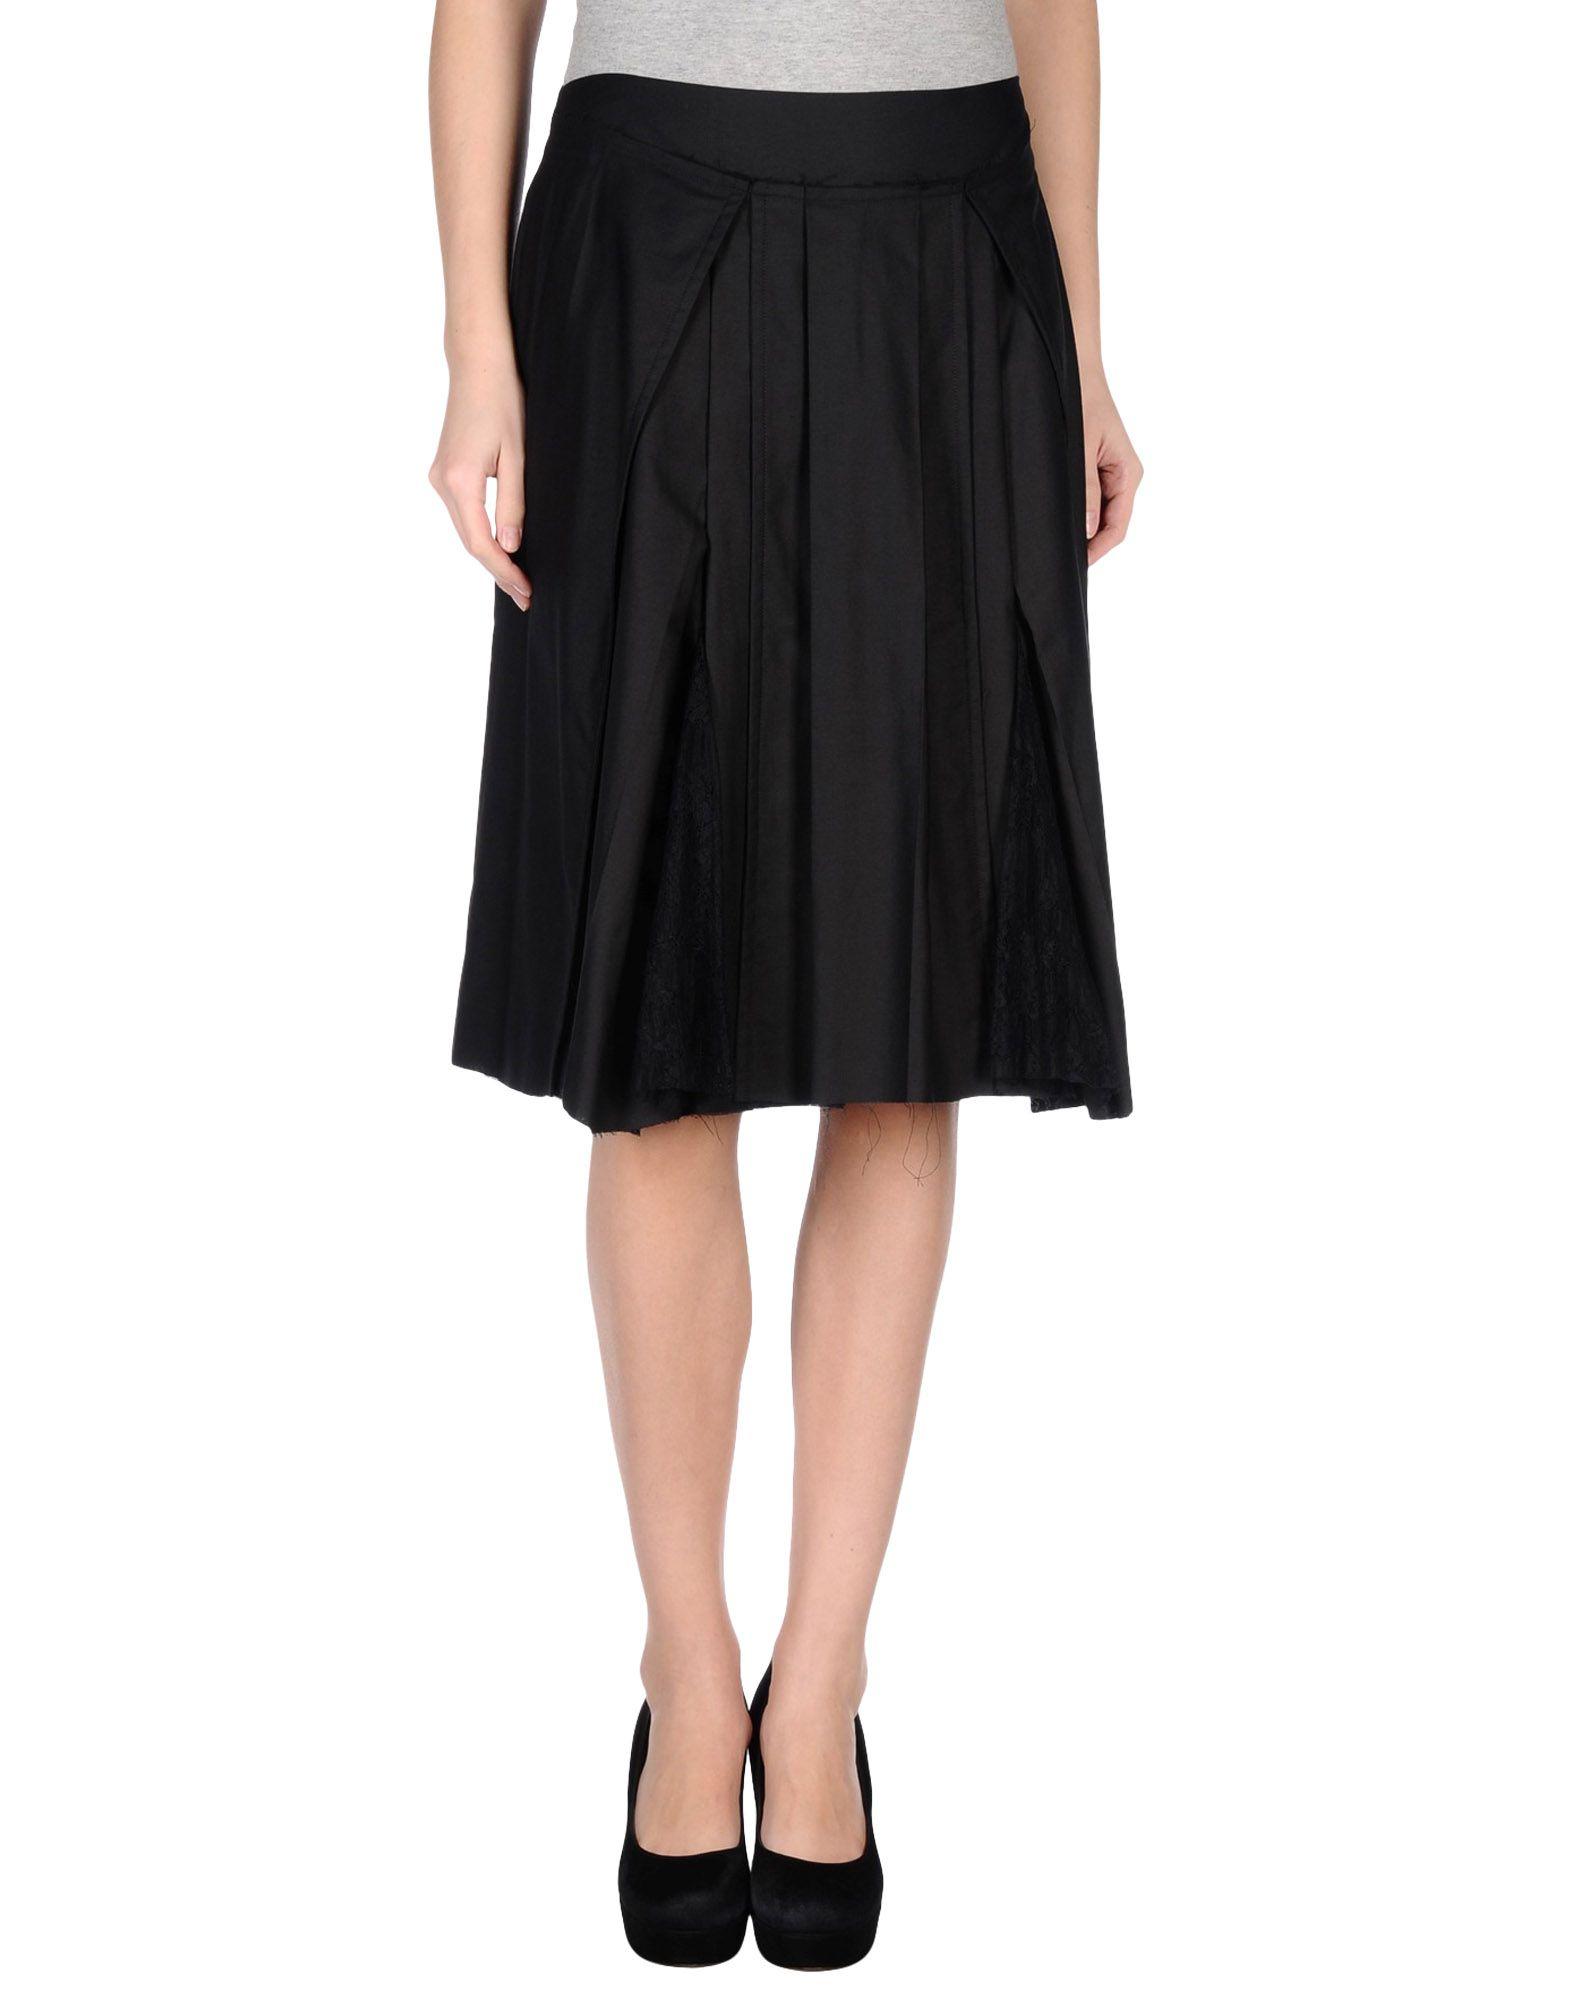 Philosophy di alberta ferretti Knee Length Skirt in Black | Lyst